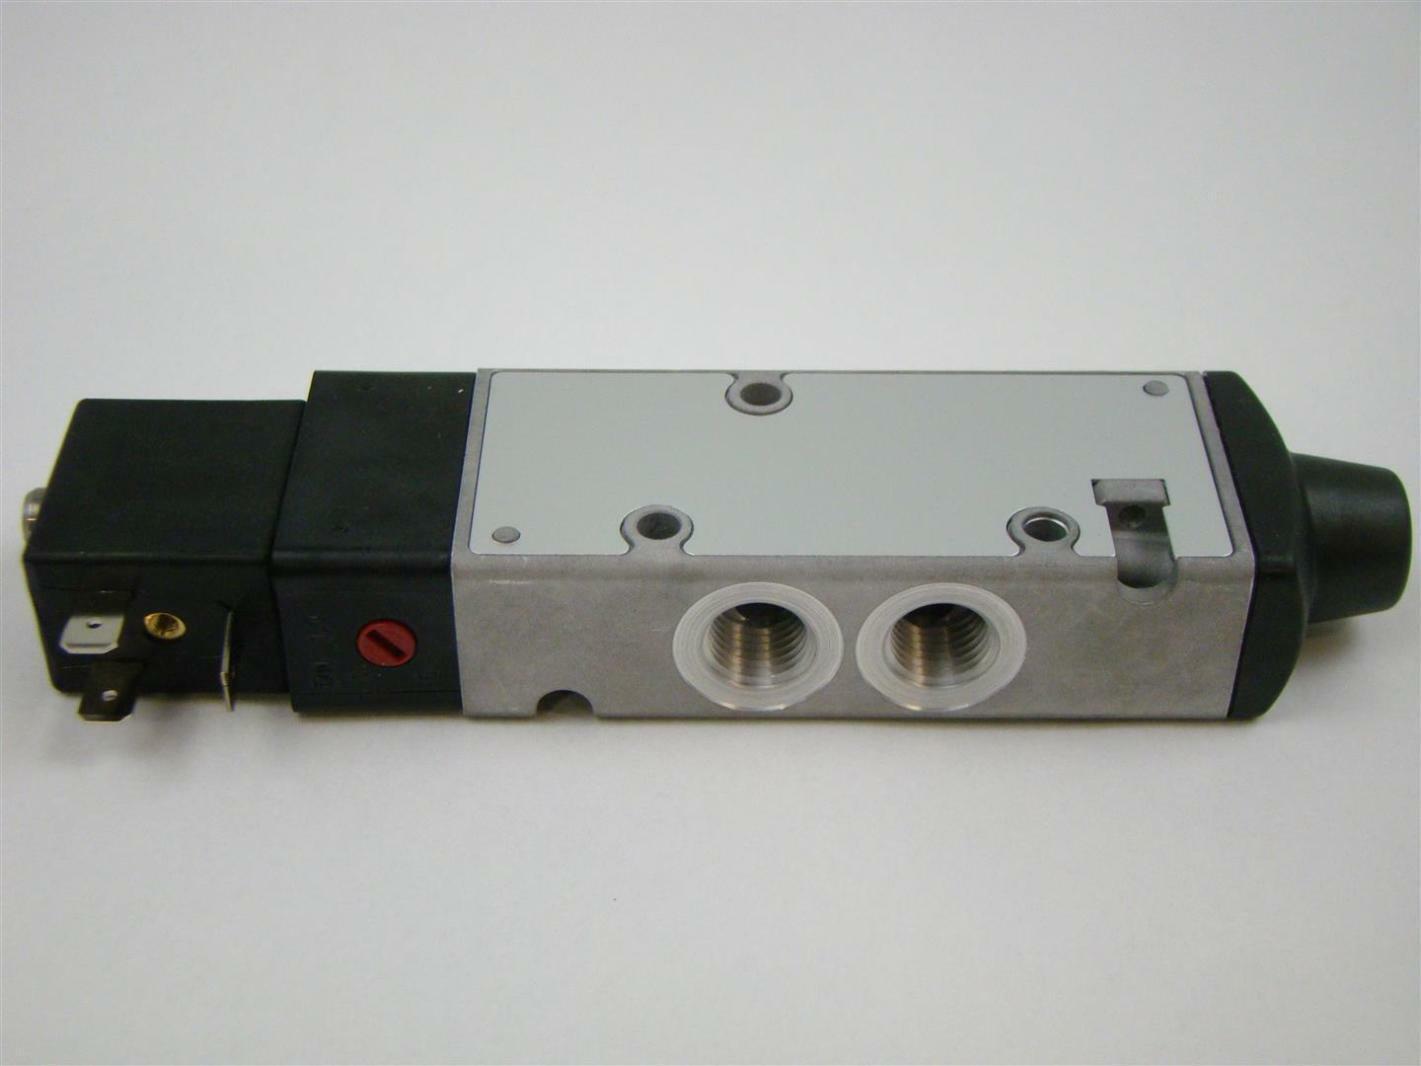 AA551-5 7X1//2X1-1//4 9A60J12V52 BAYSTATE GRINDING WHEEL